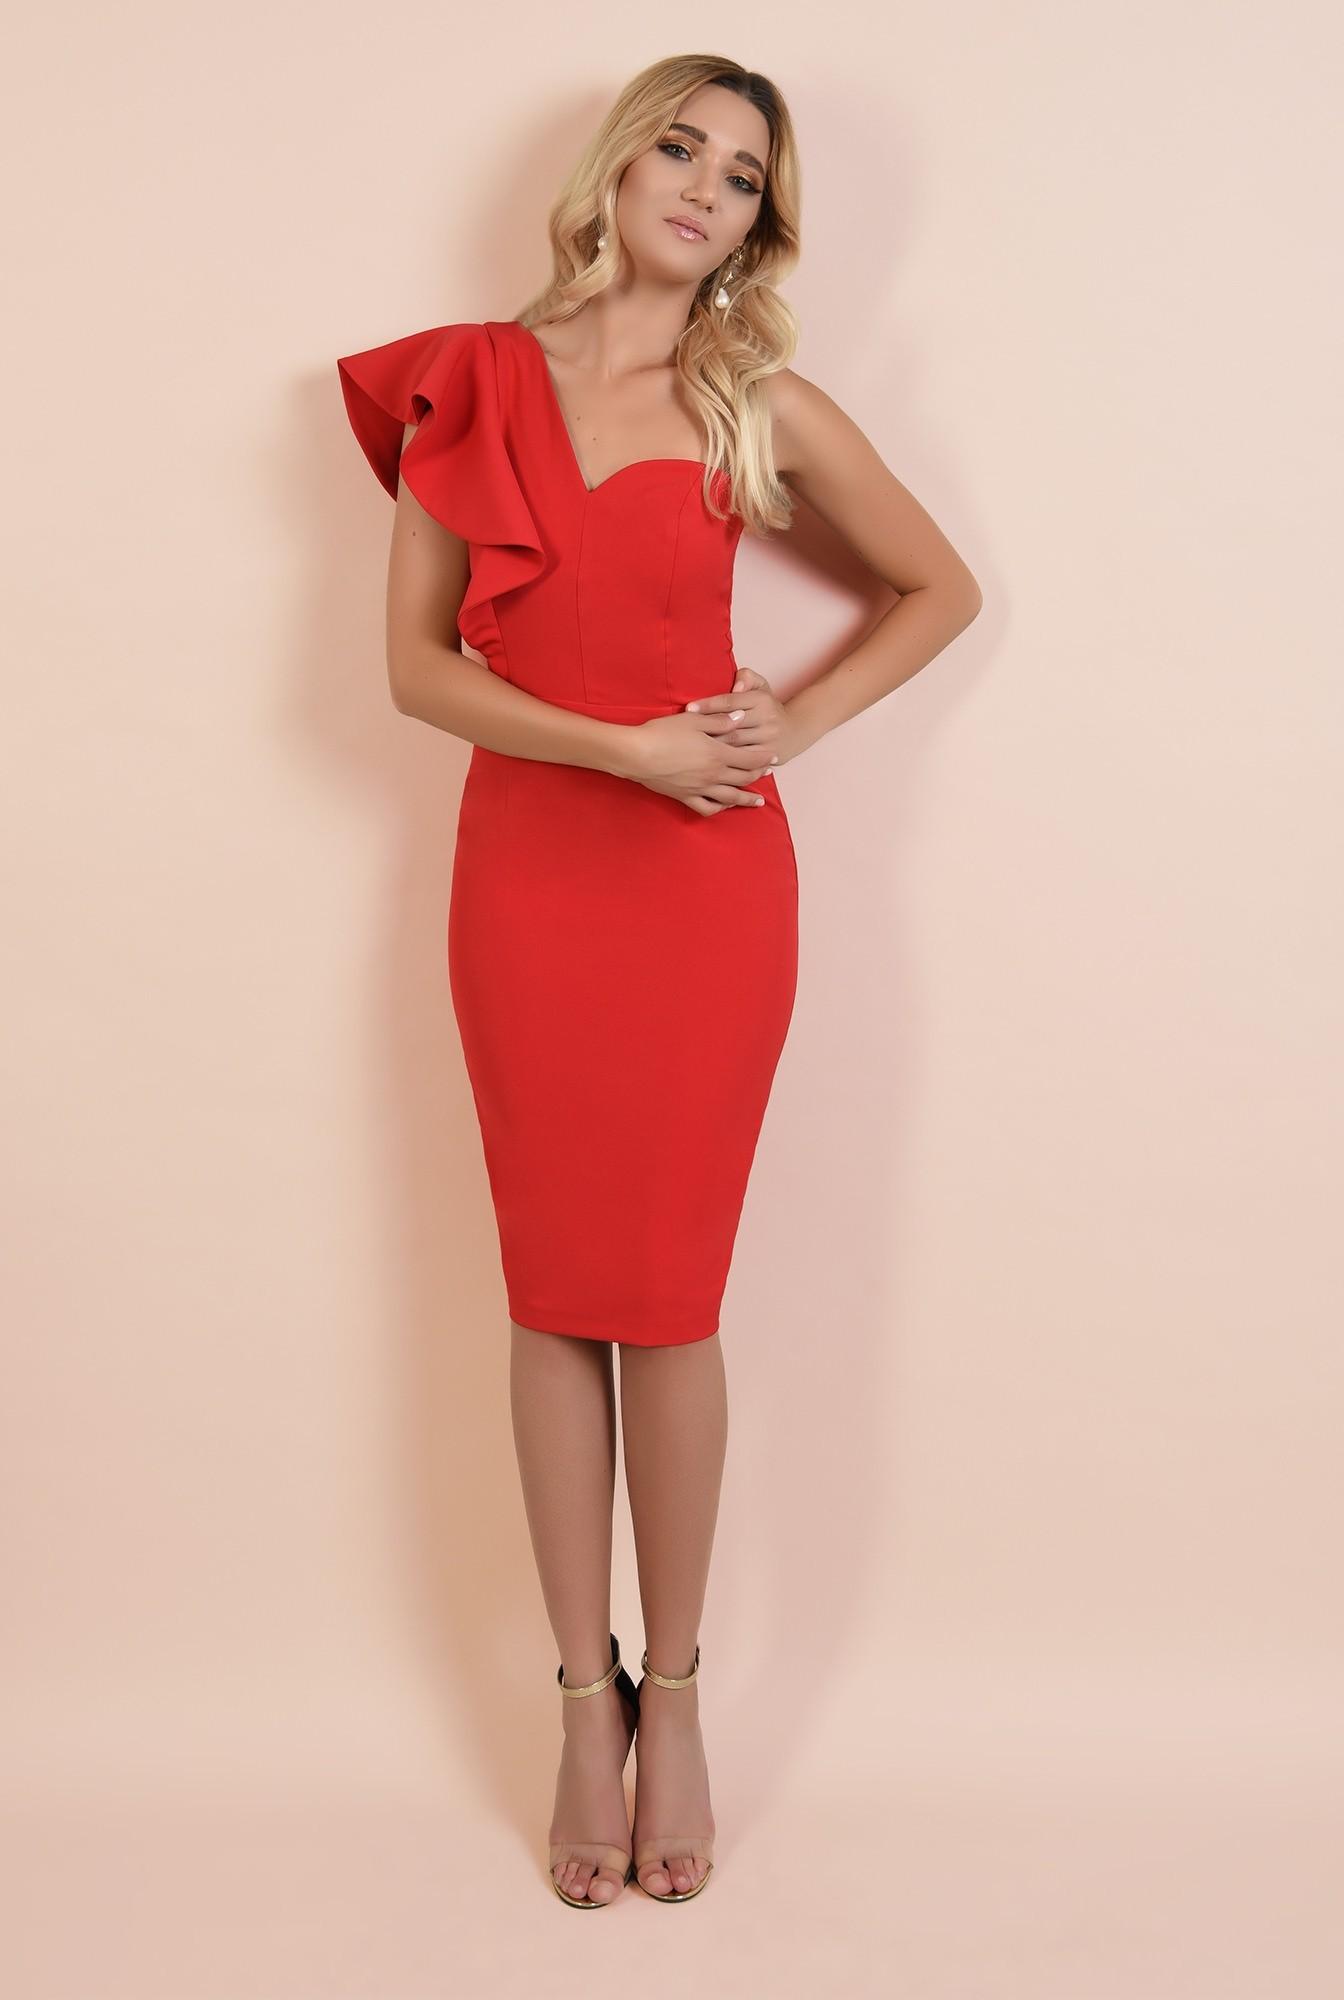 360 - rochie rosie, de ocazie, midi, conica, decolteu inima